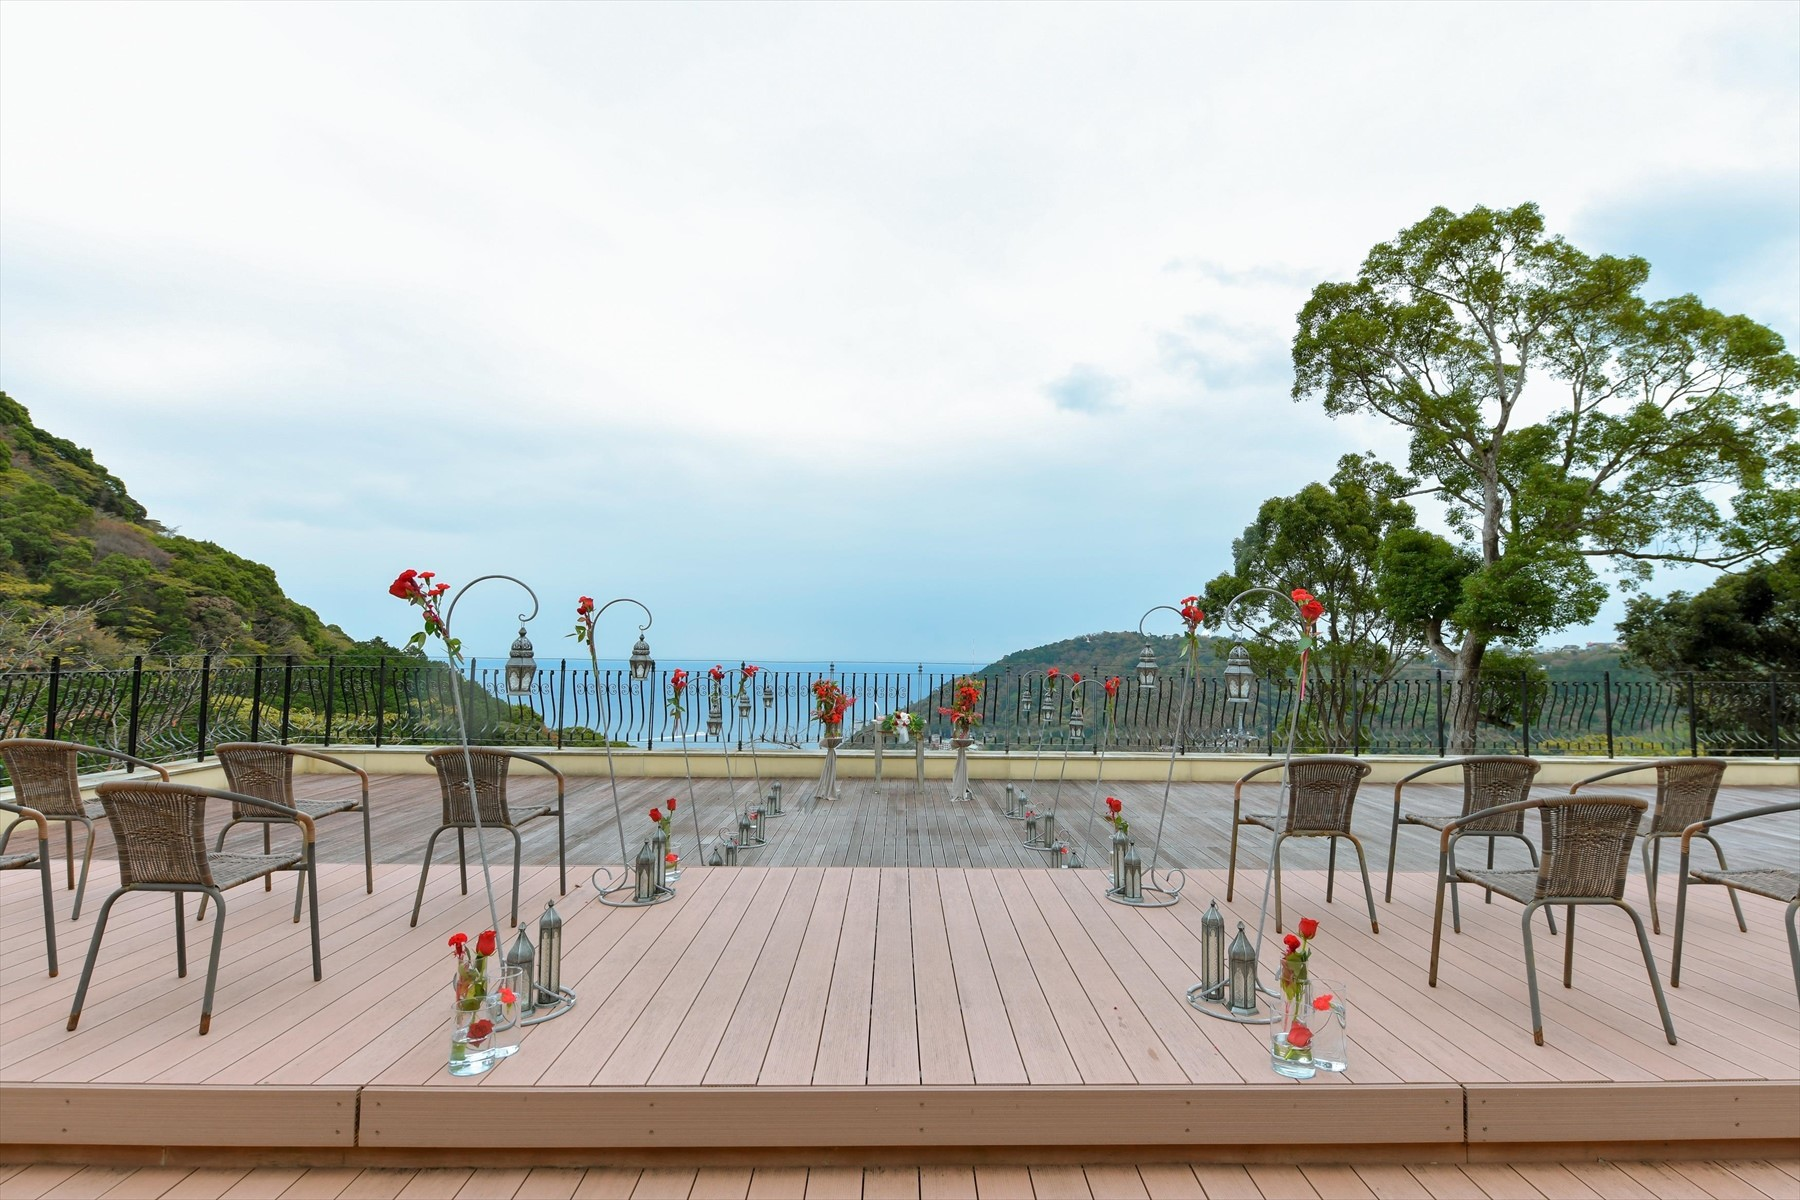 静岡県熱海結婚式場 東静岡結婚式 熱海スパ&リゾート